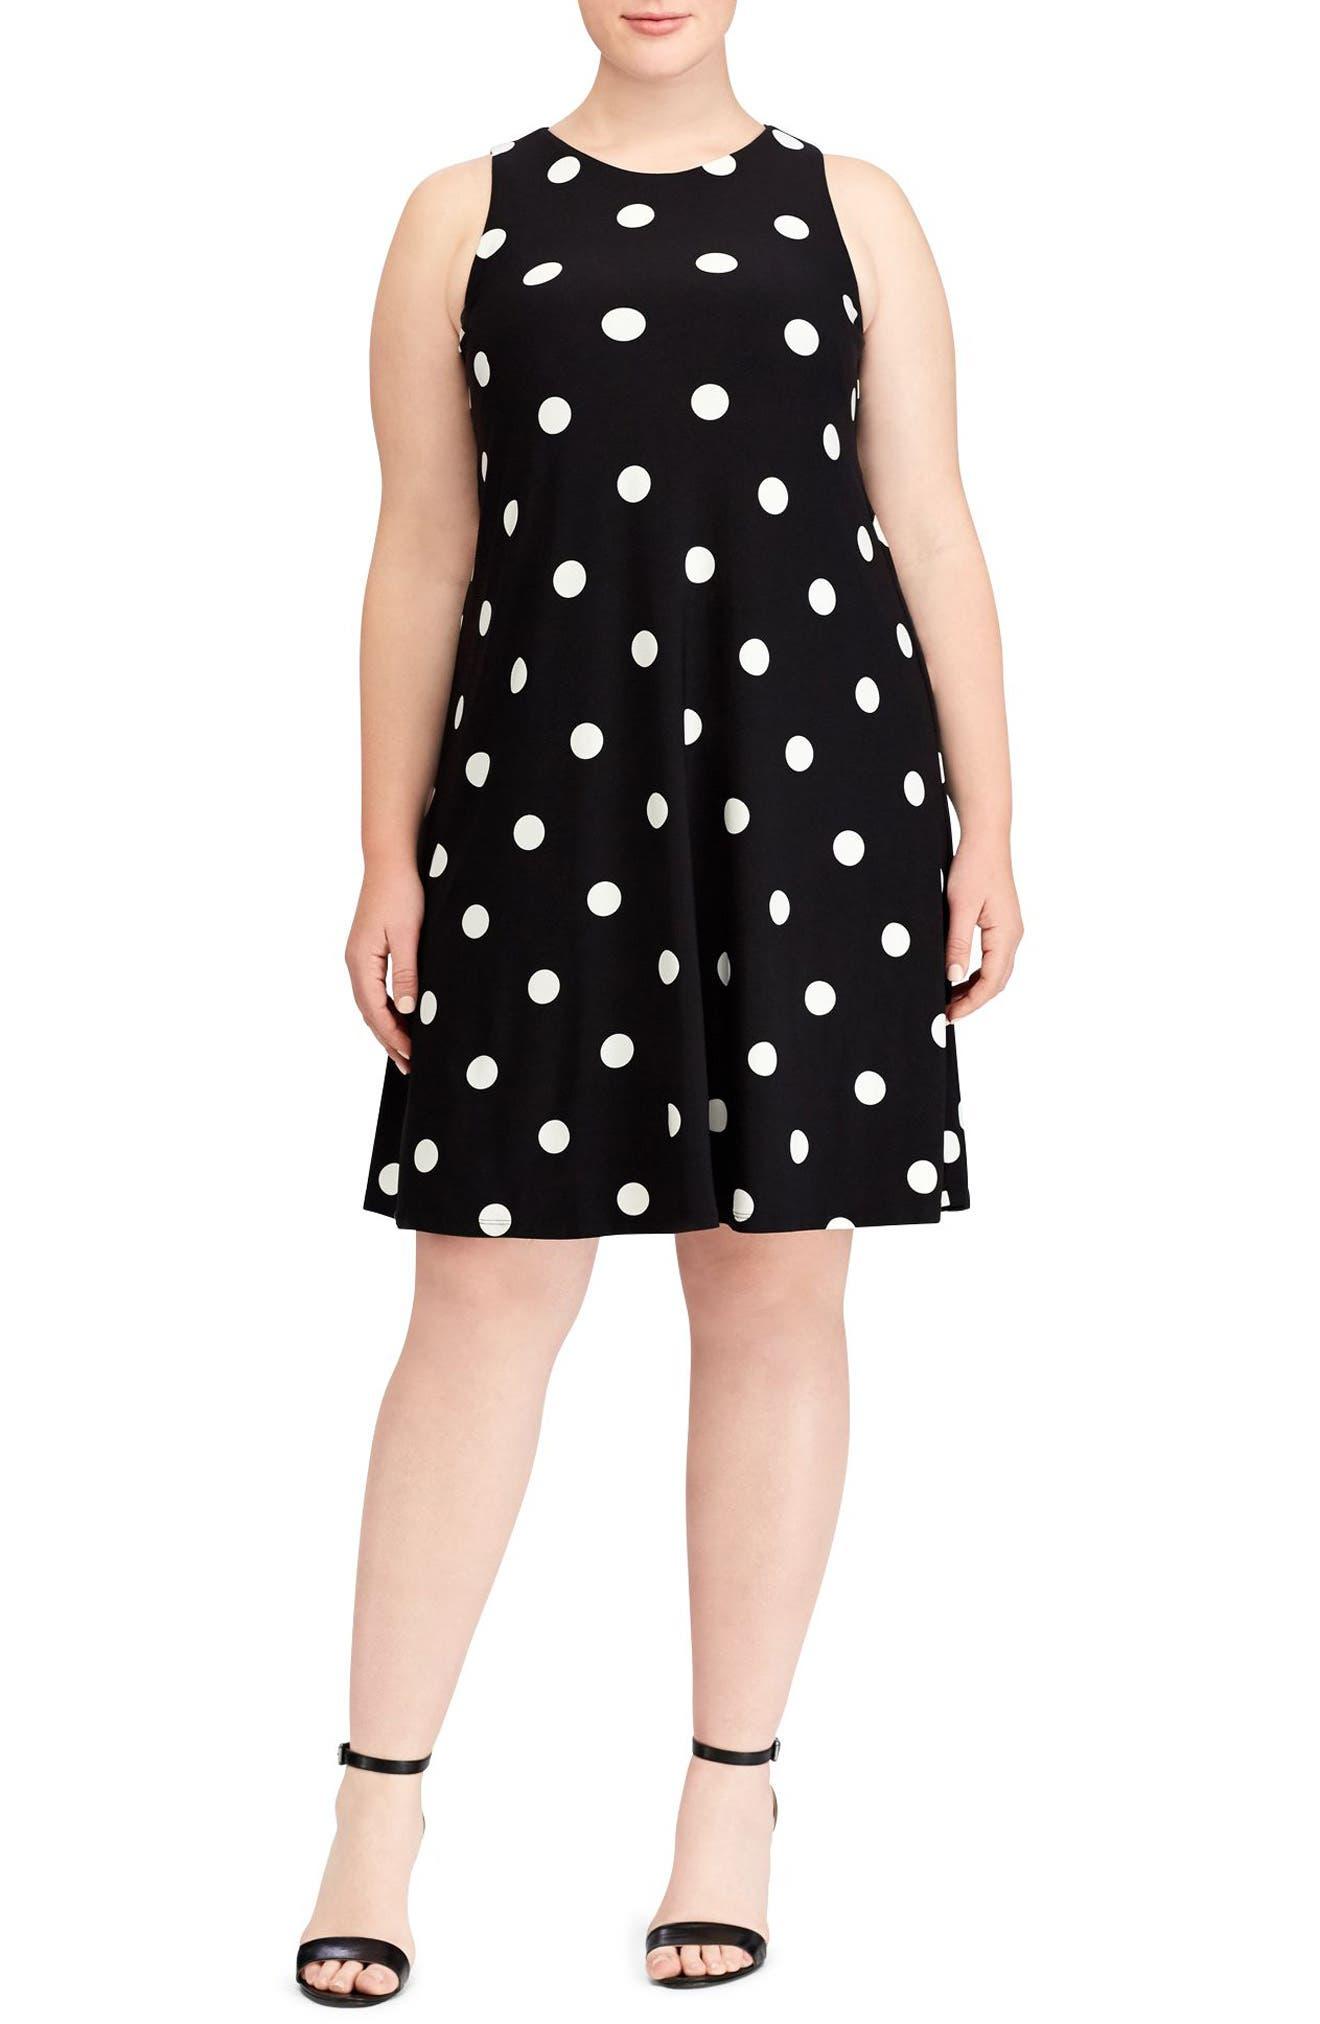 Suzan Peninsula Dot Shift Dress,                         Main,                         color, Black-Colonial Cream